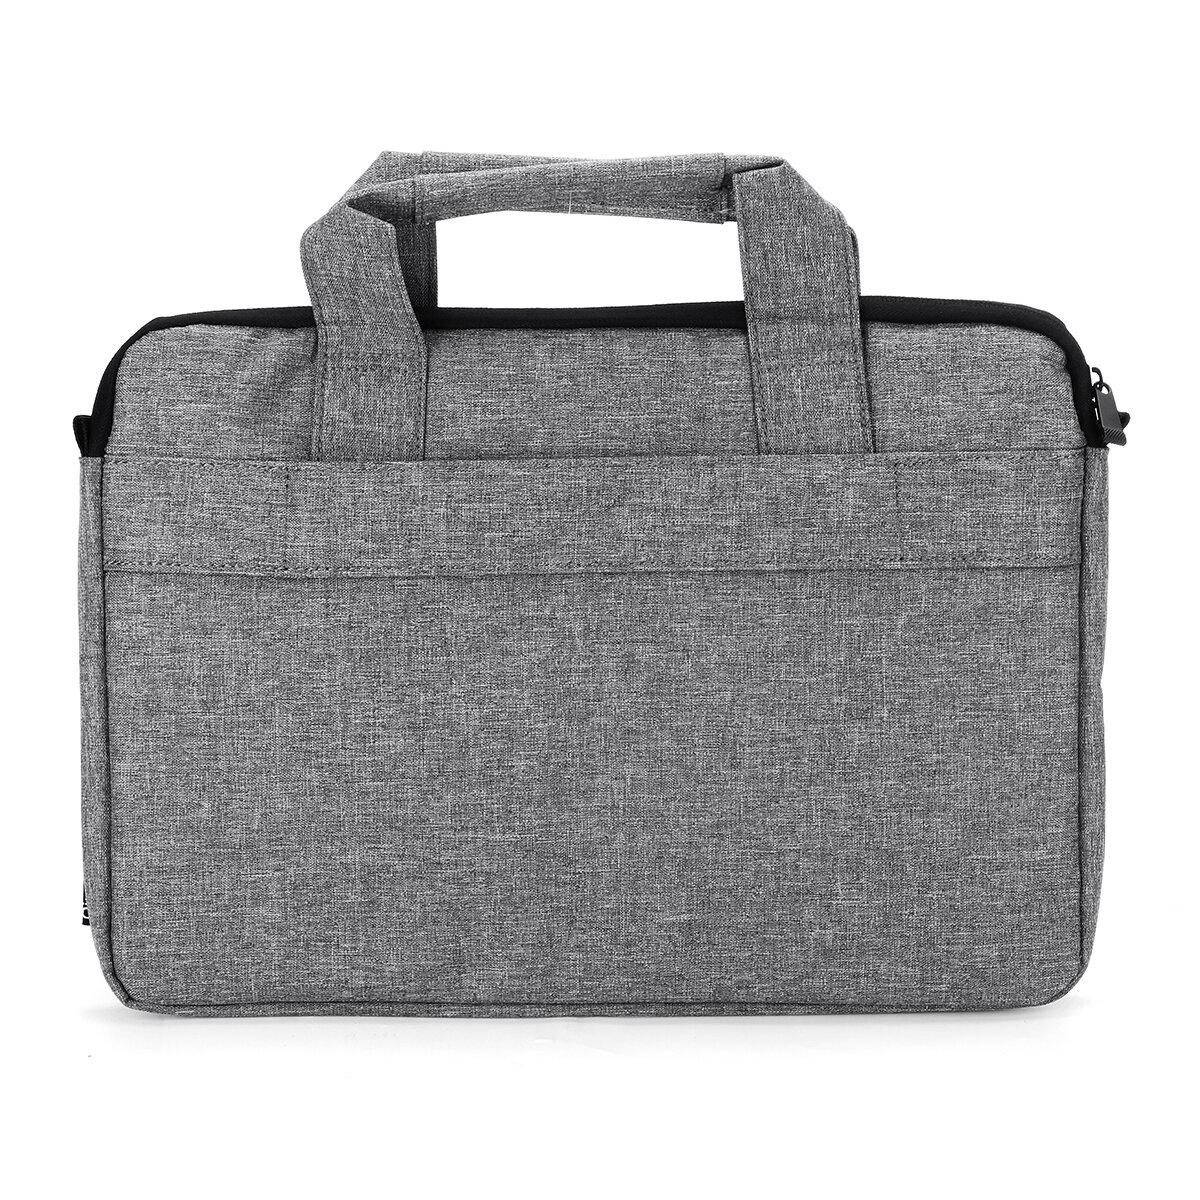 Water Resistant Shockproof Laptop Bag Handbag For Laptop MacBook Within 13/14/15.6 inch